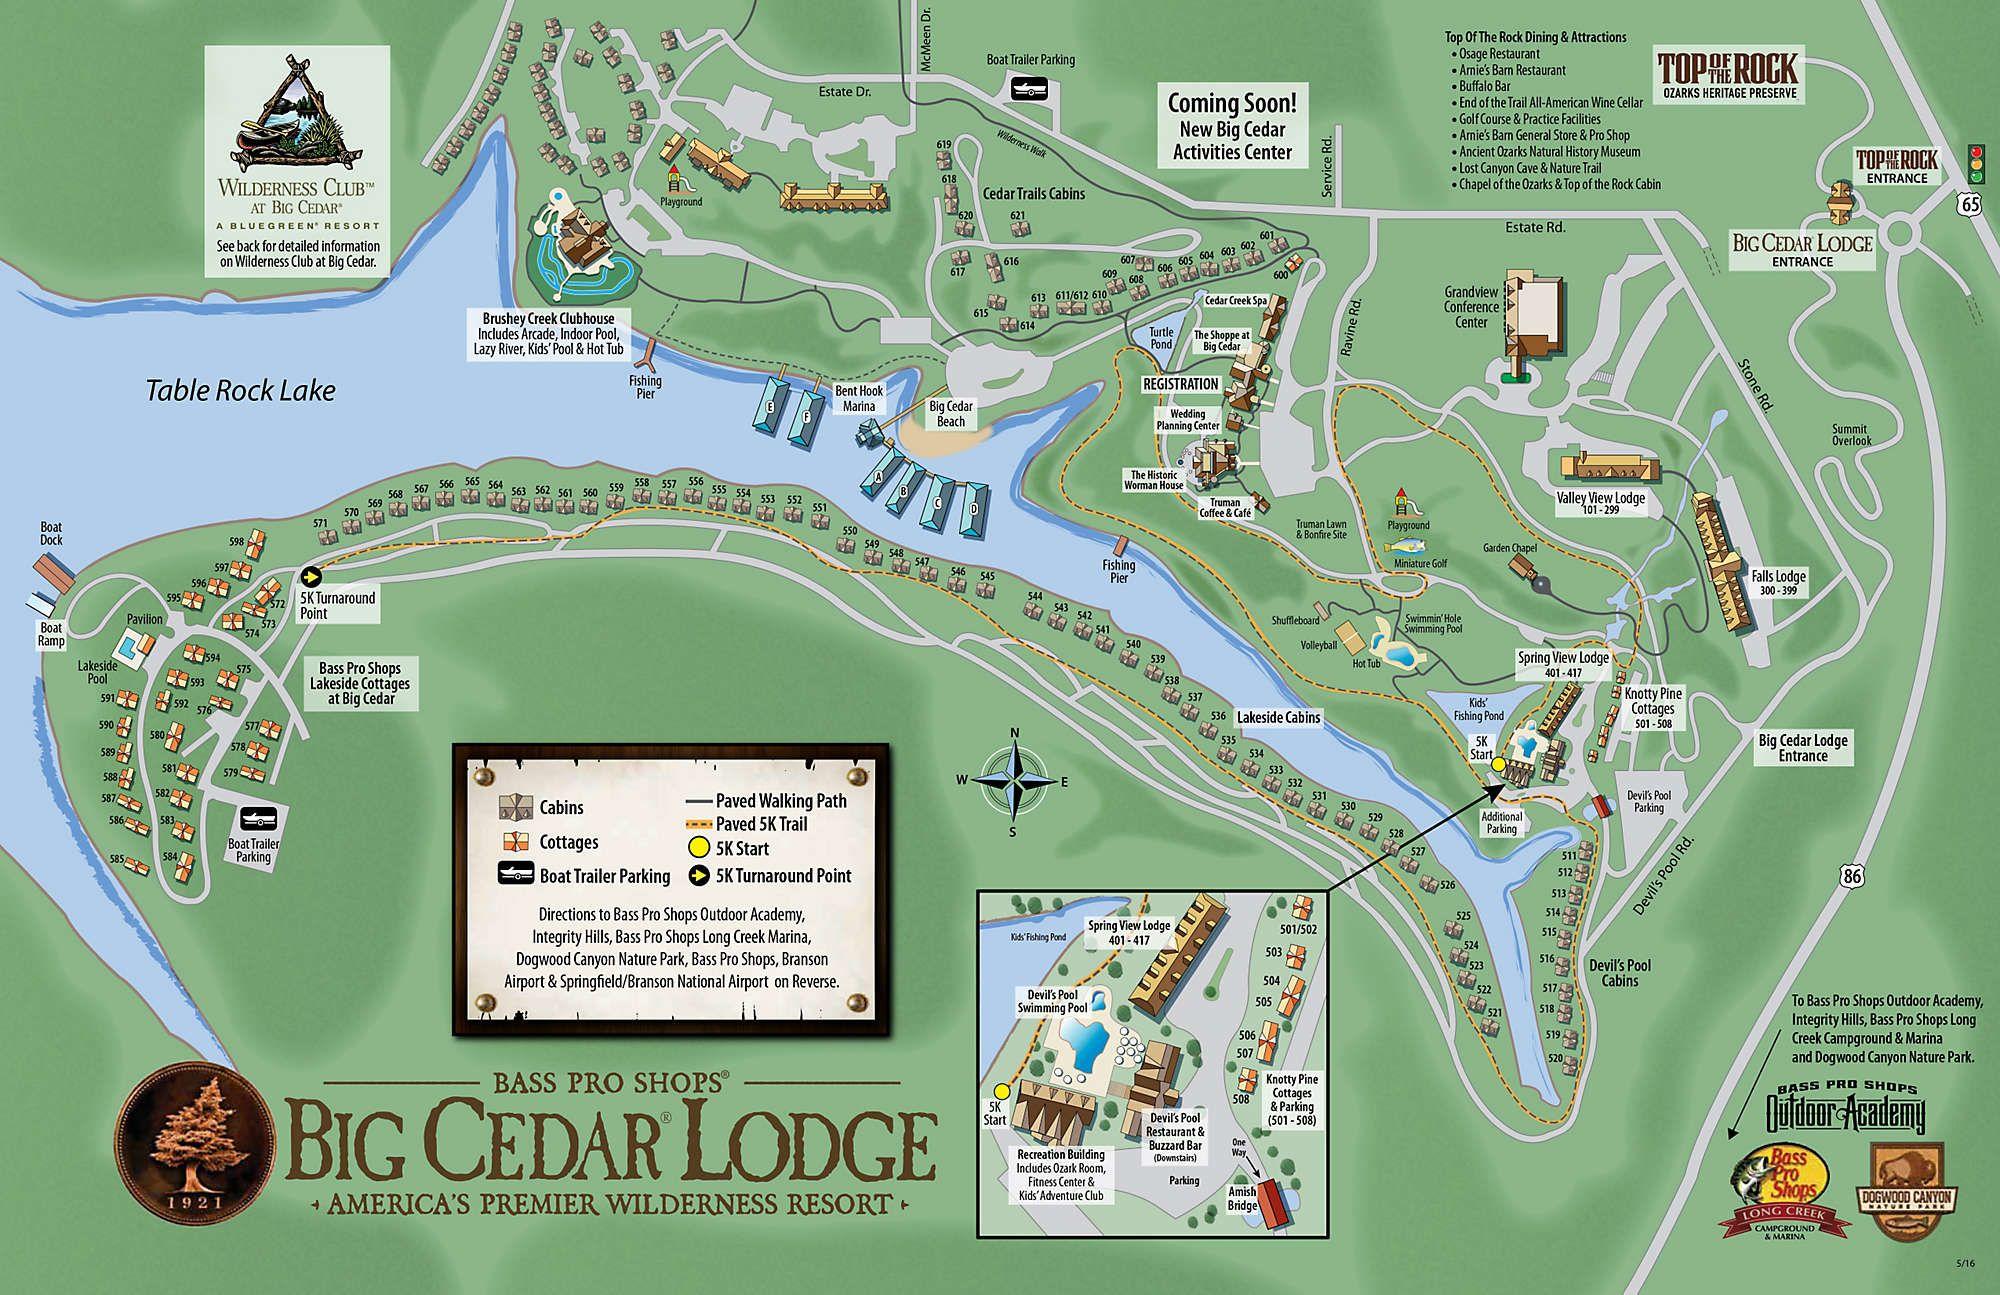 Bluegreen Wilderness Club at Big Cedar® Big cedar lodge